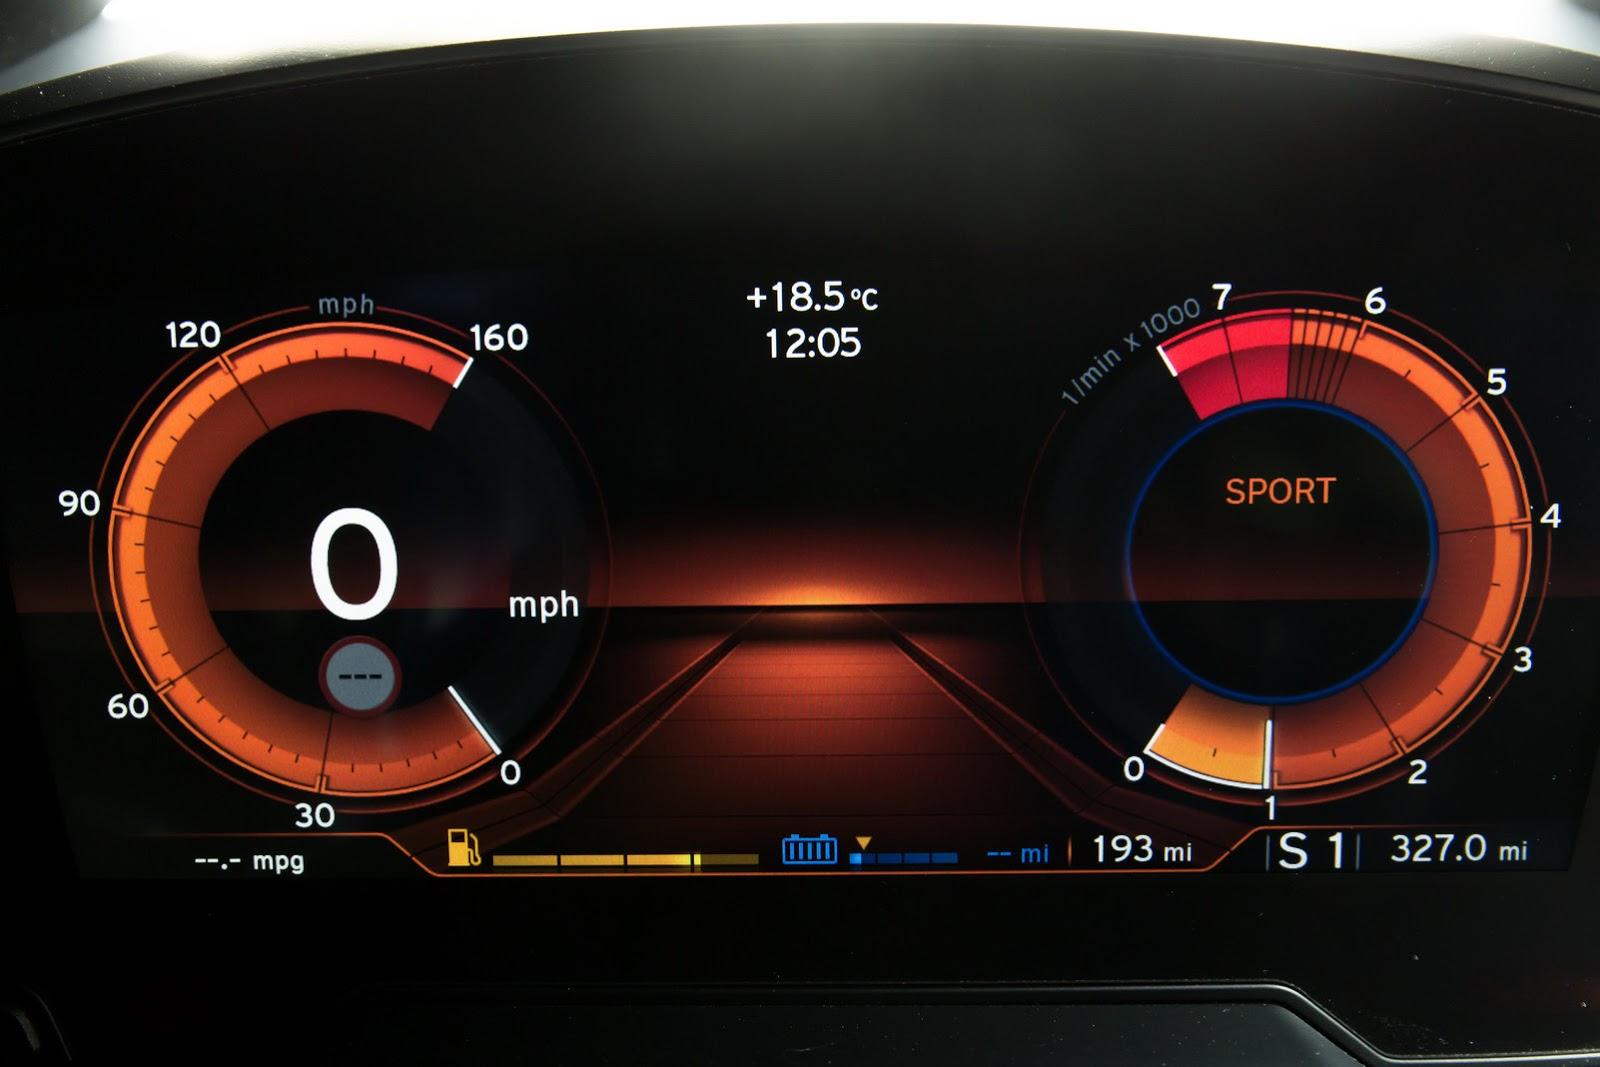 2015 BMW i8 Instrument Panel